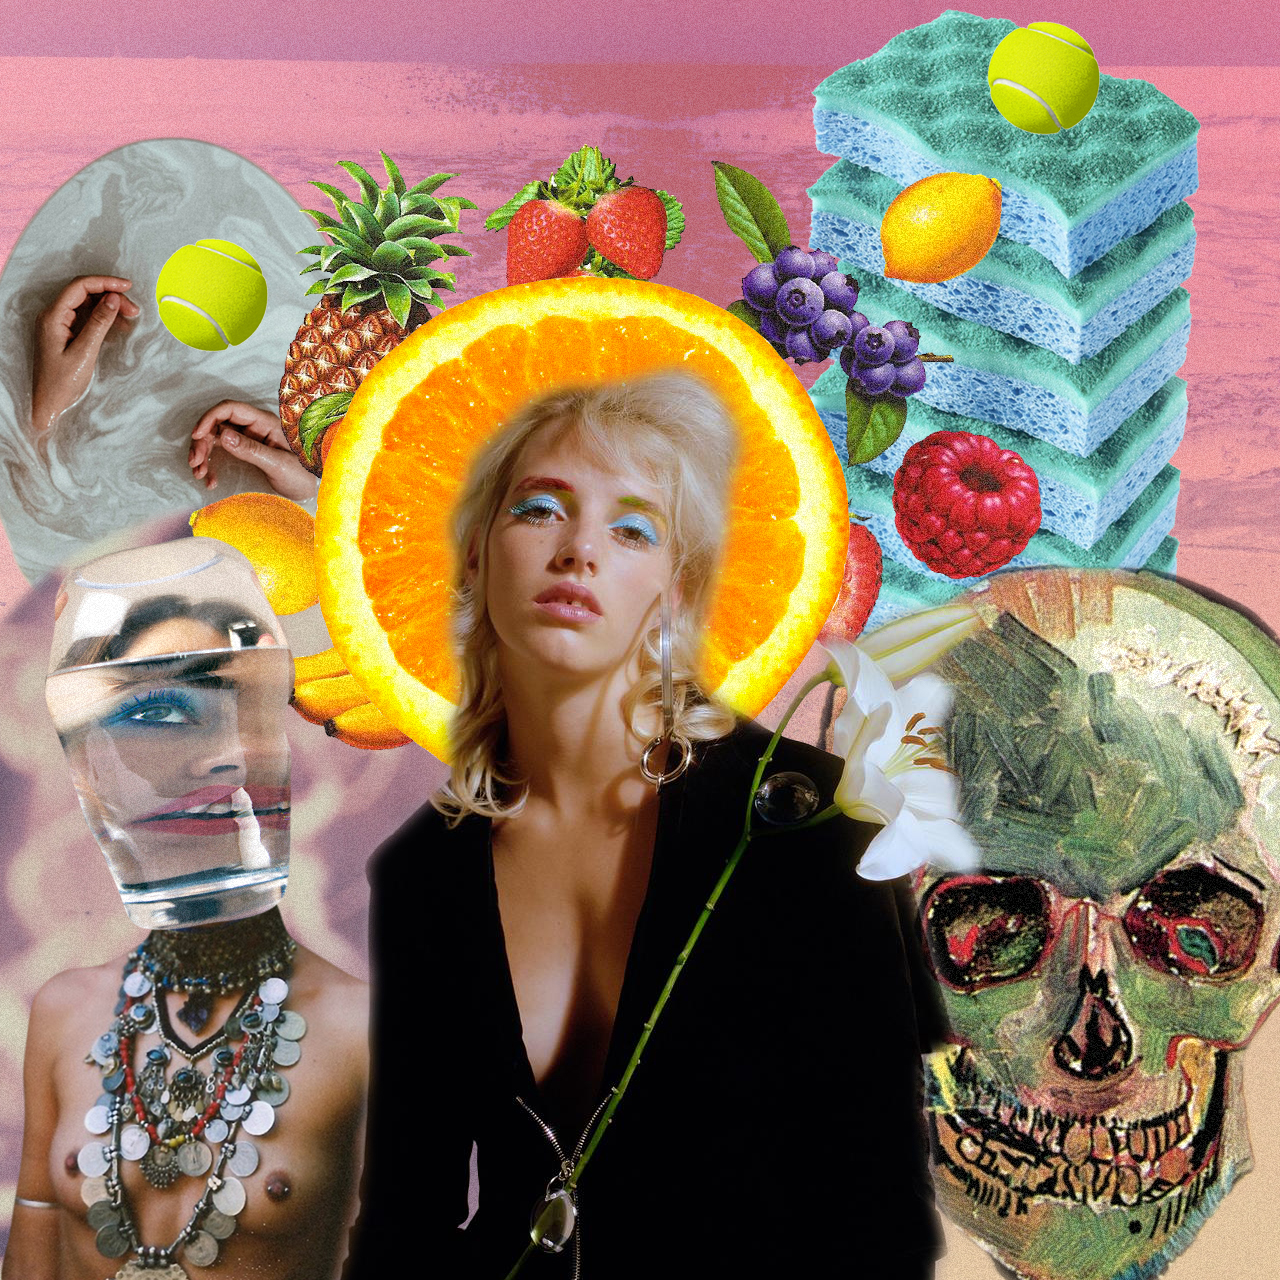 A Pretty Mind [collage, 2016]